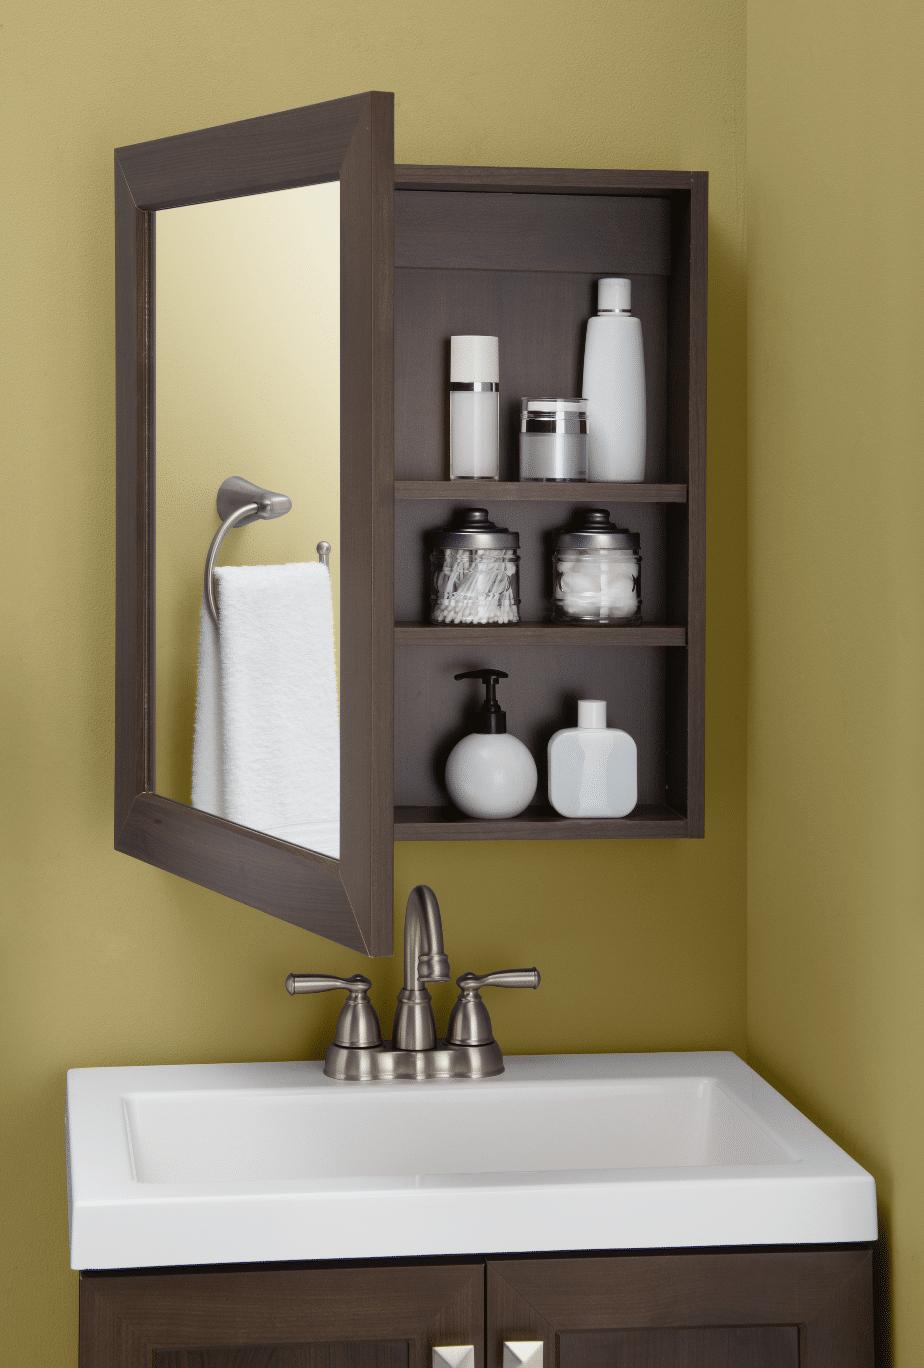 7 Ideas Para Ba Os Peque Os The Home Depot Blog # Muebles Pequenos Para Banos